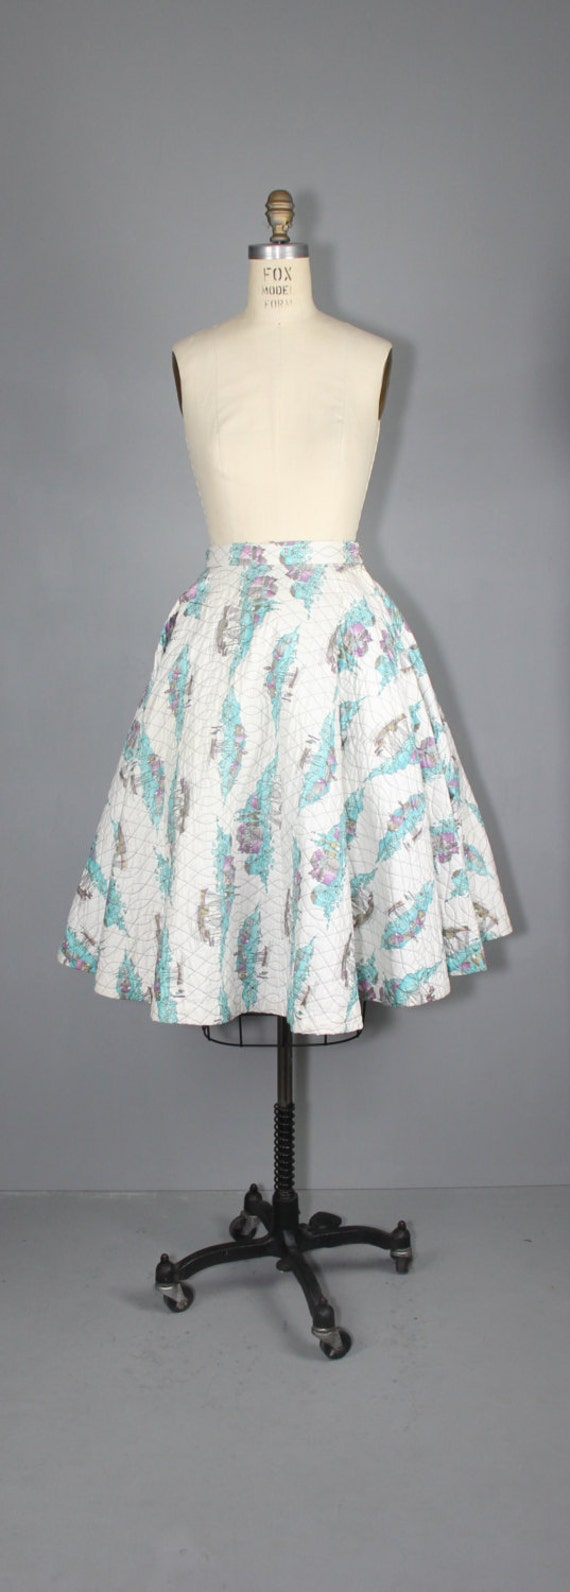 1950s skirt / circle skirt / novelty print / COAS… - image 3